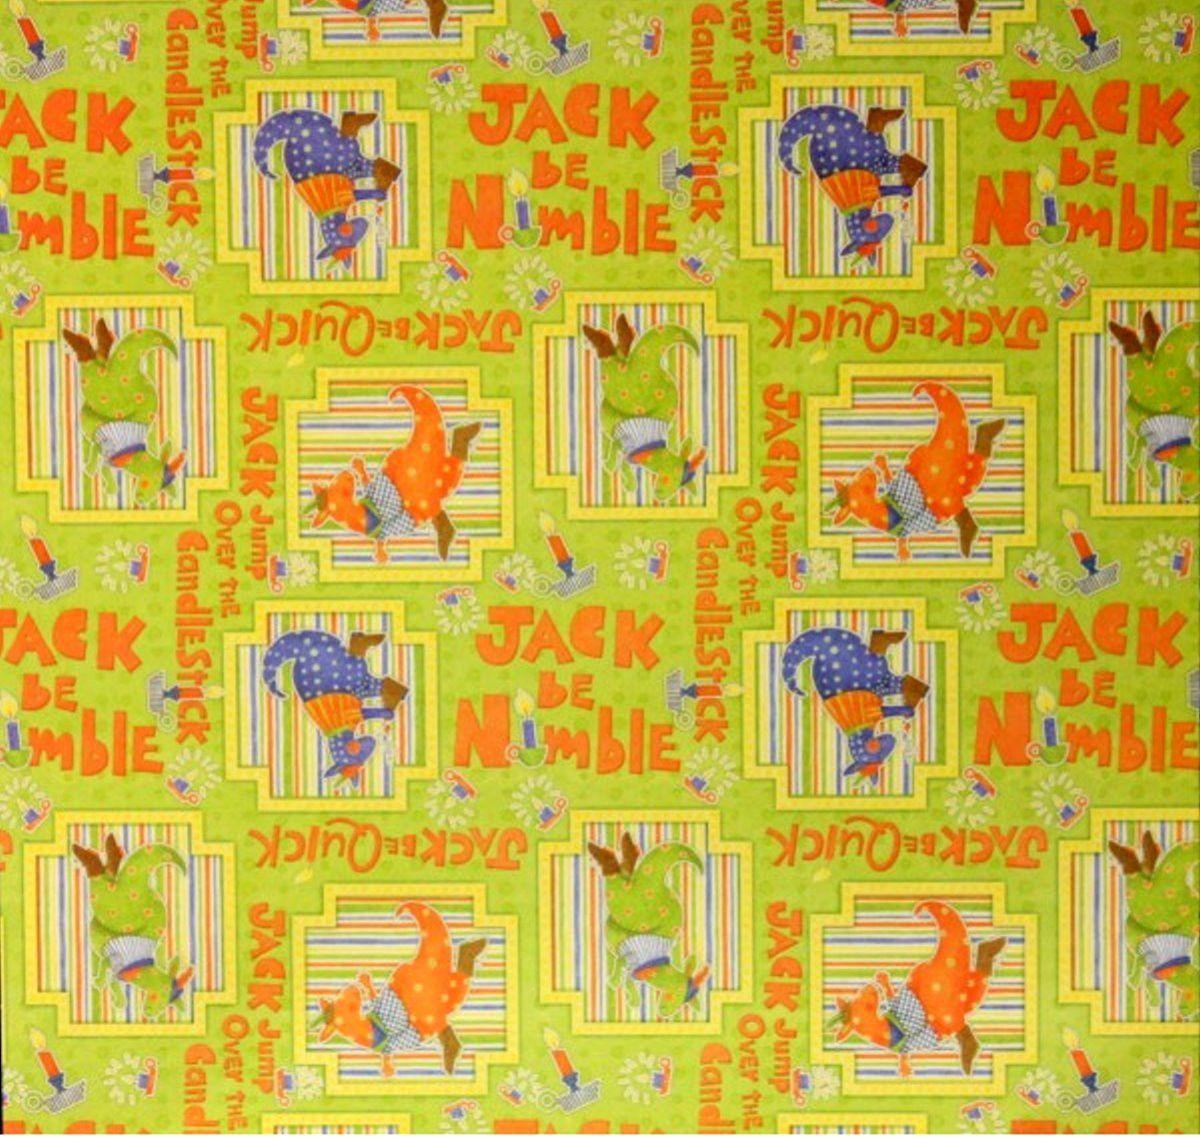 Scrapbook paper cardstock - Dcwv Jack Be Nimble Nursery Rhymes Cardstock Scrapbook Paper